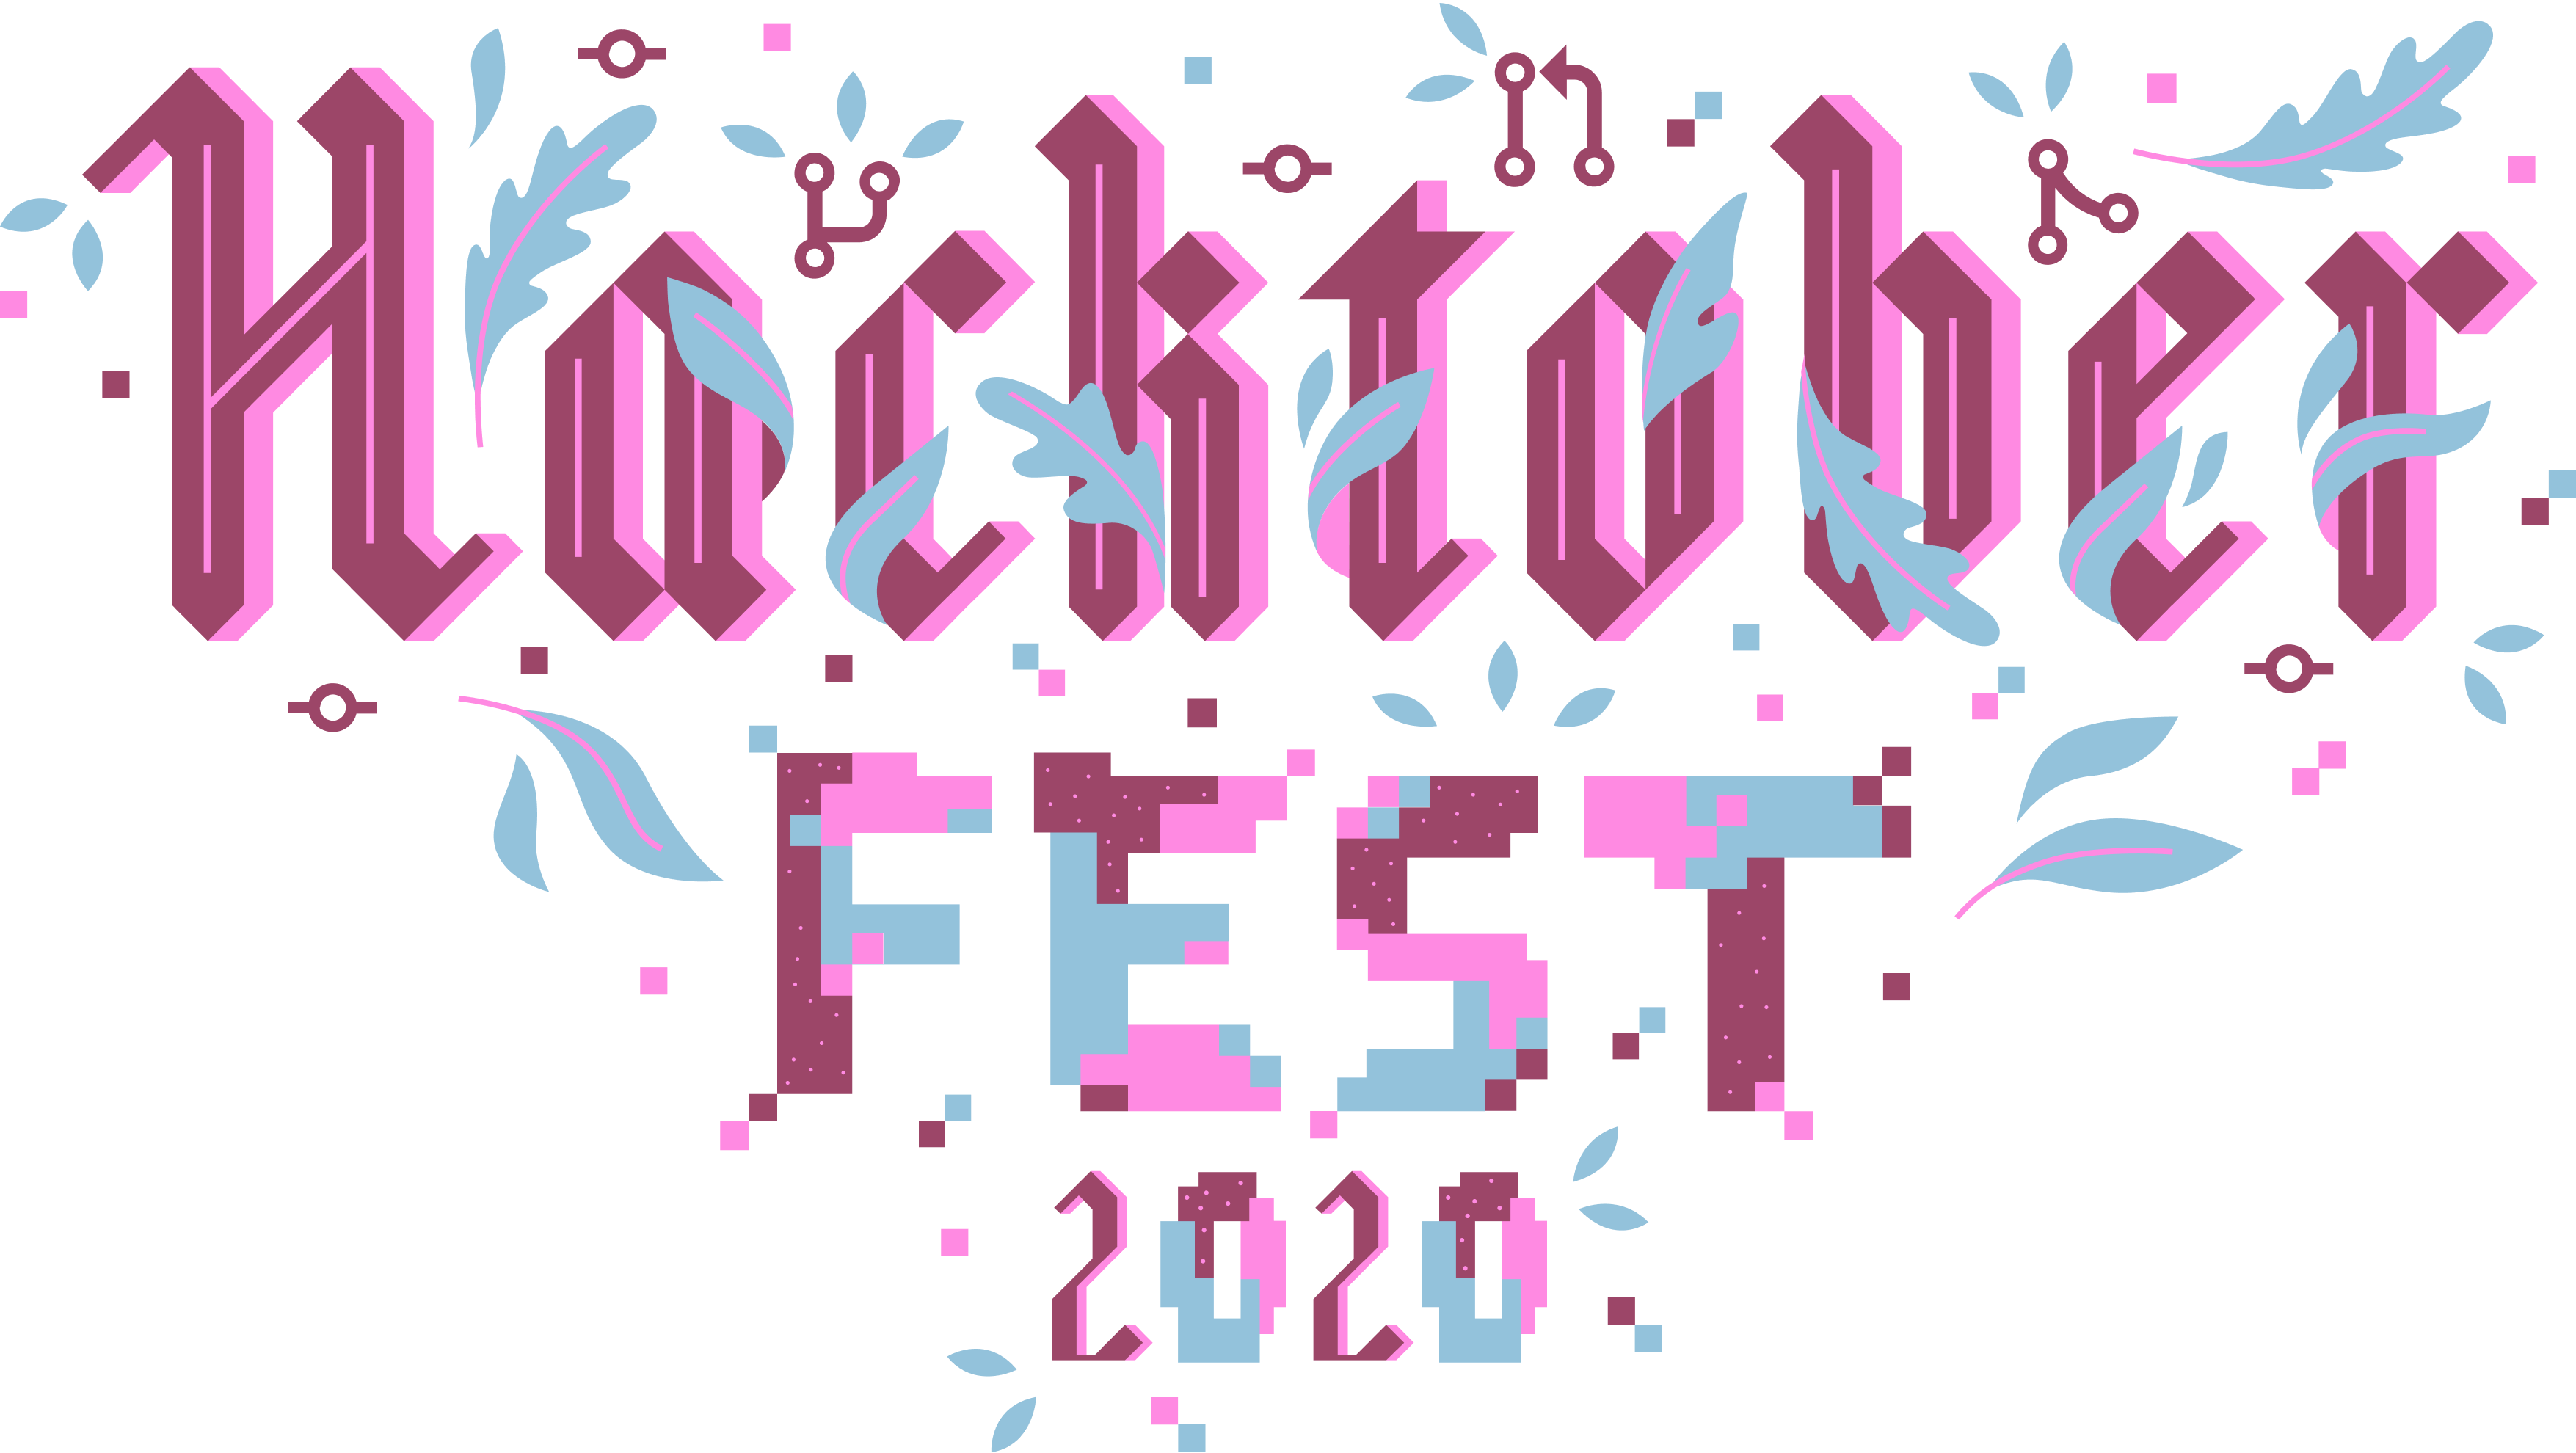 Hacktober Fest 2020